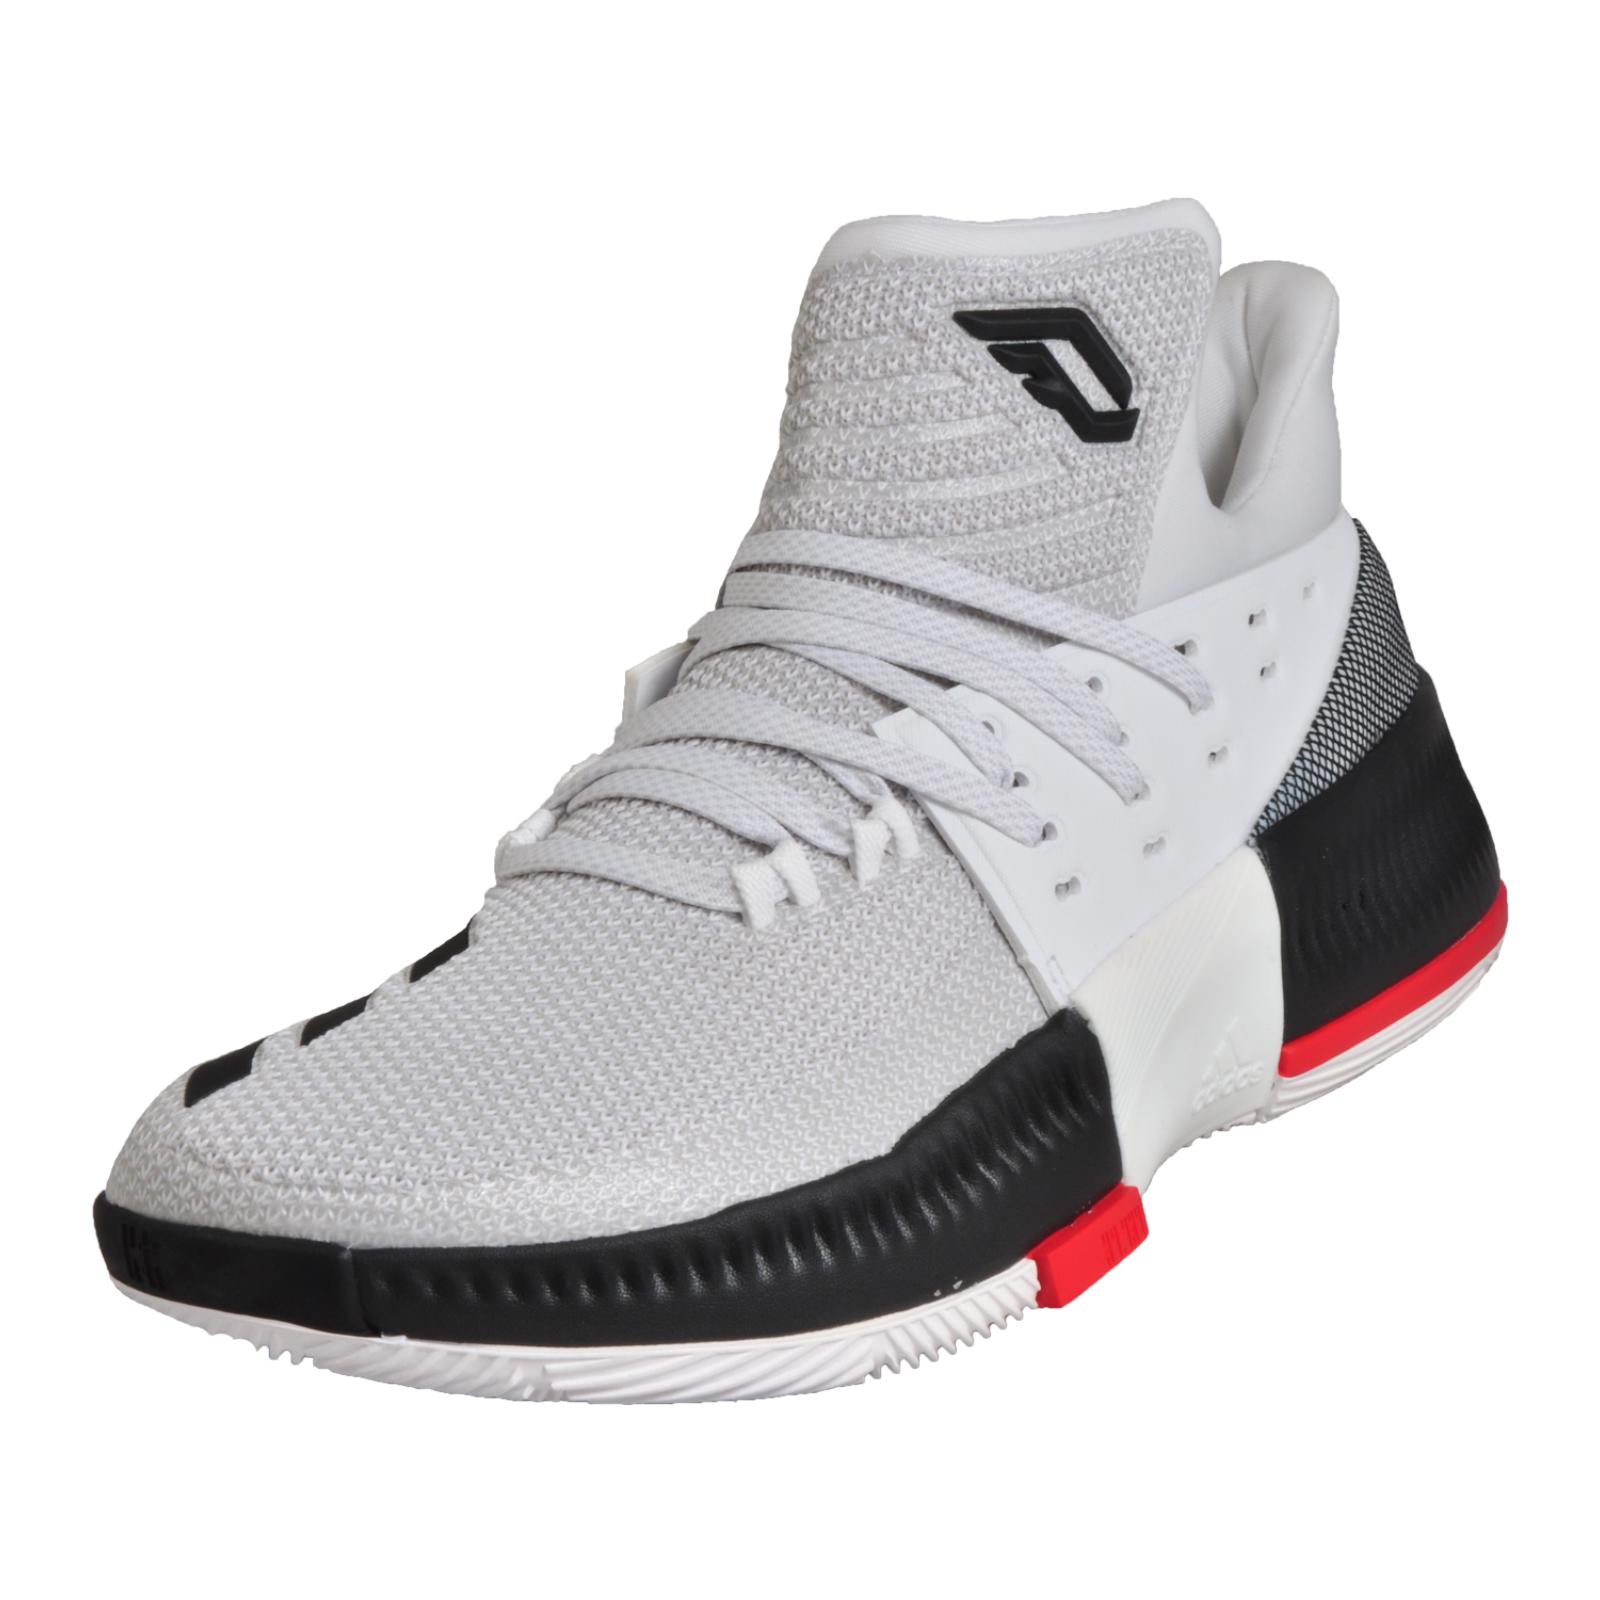 065fb089f479d7 Adidas Damian Lillard 3 Mens Crazy Time Basketball CourtTrainers White